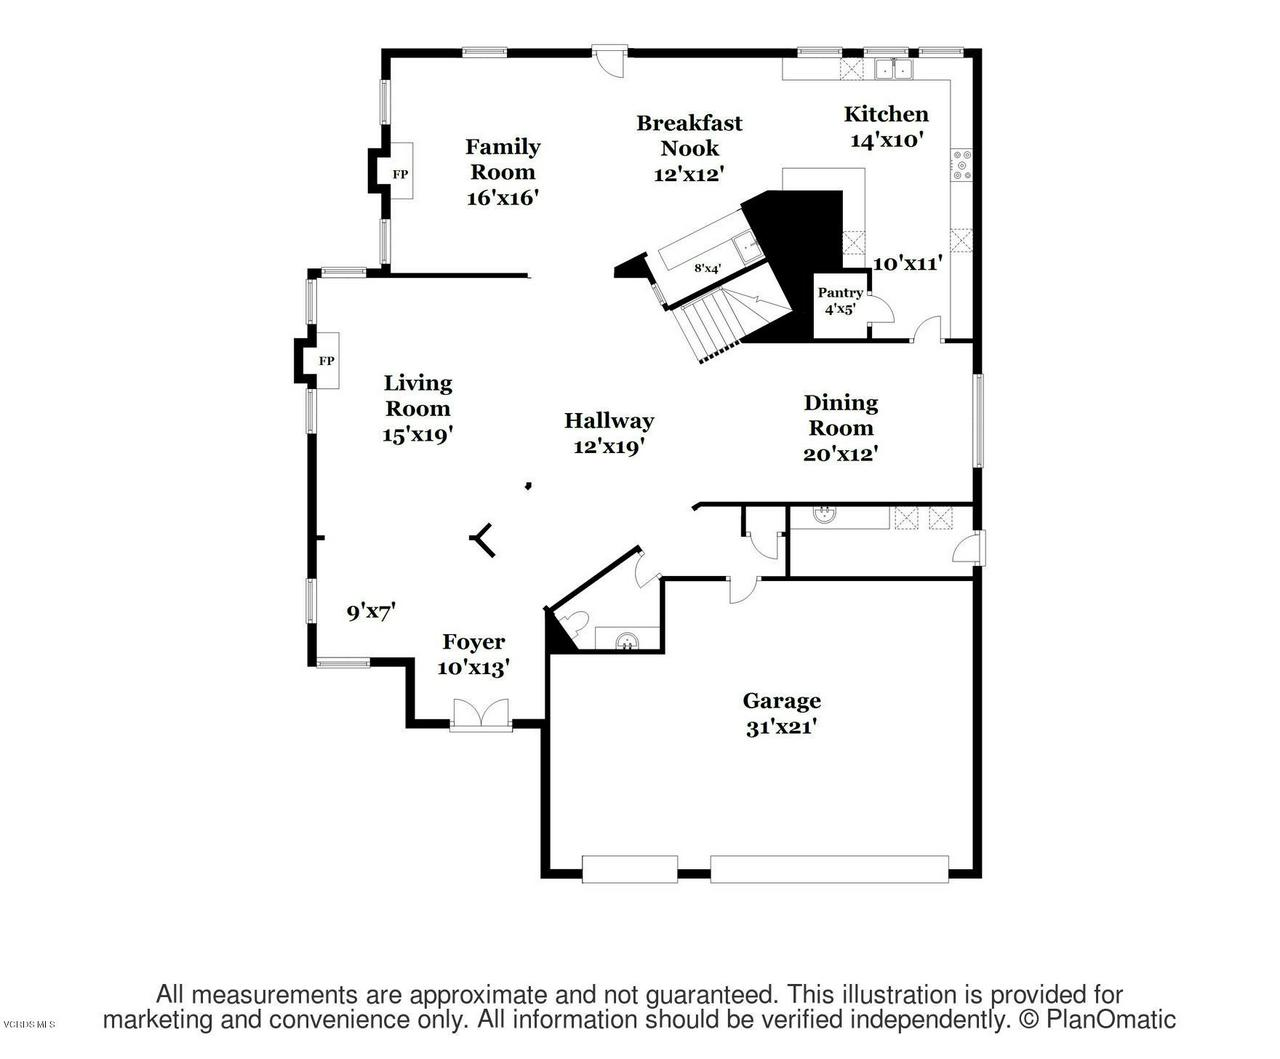 4365 TIMBERDALE, Moorpark, CA 93021 - floorplan-main-380474